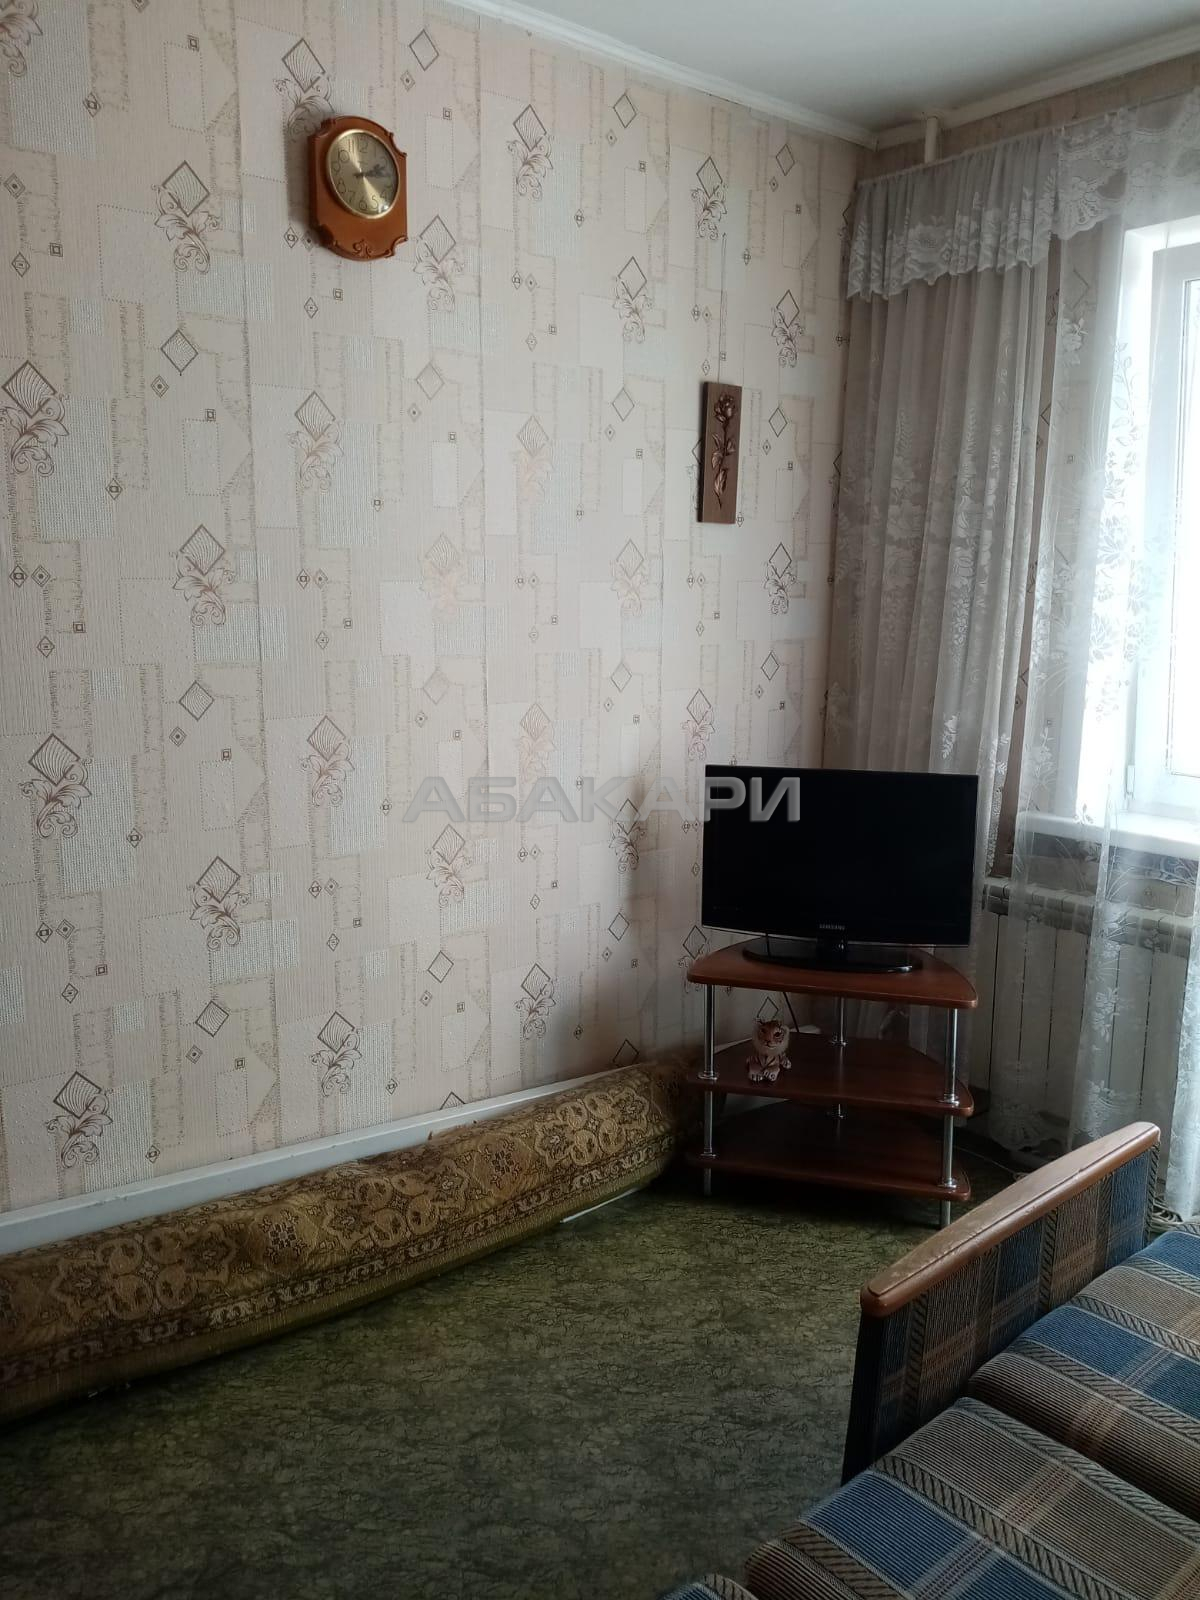 1к квартира Судостроительная улица, 97А 6/9 - 32кв | 10000 | аренда в Красноярске фото 1